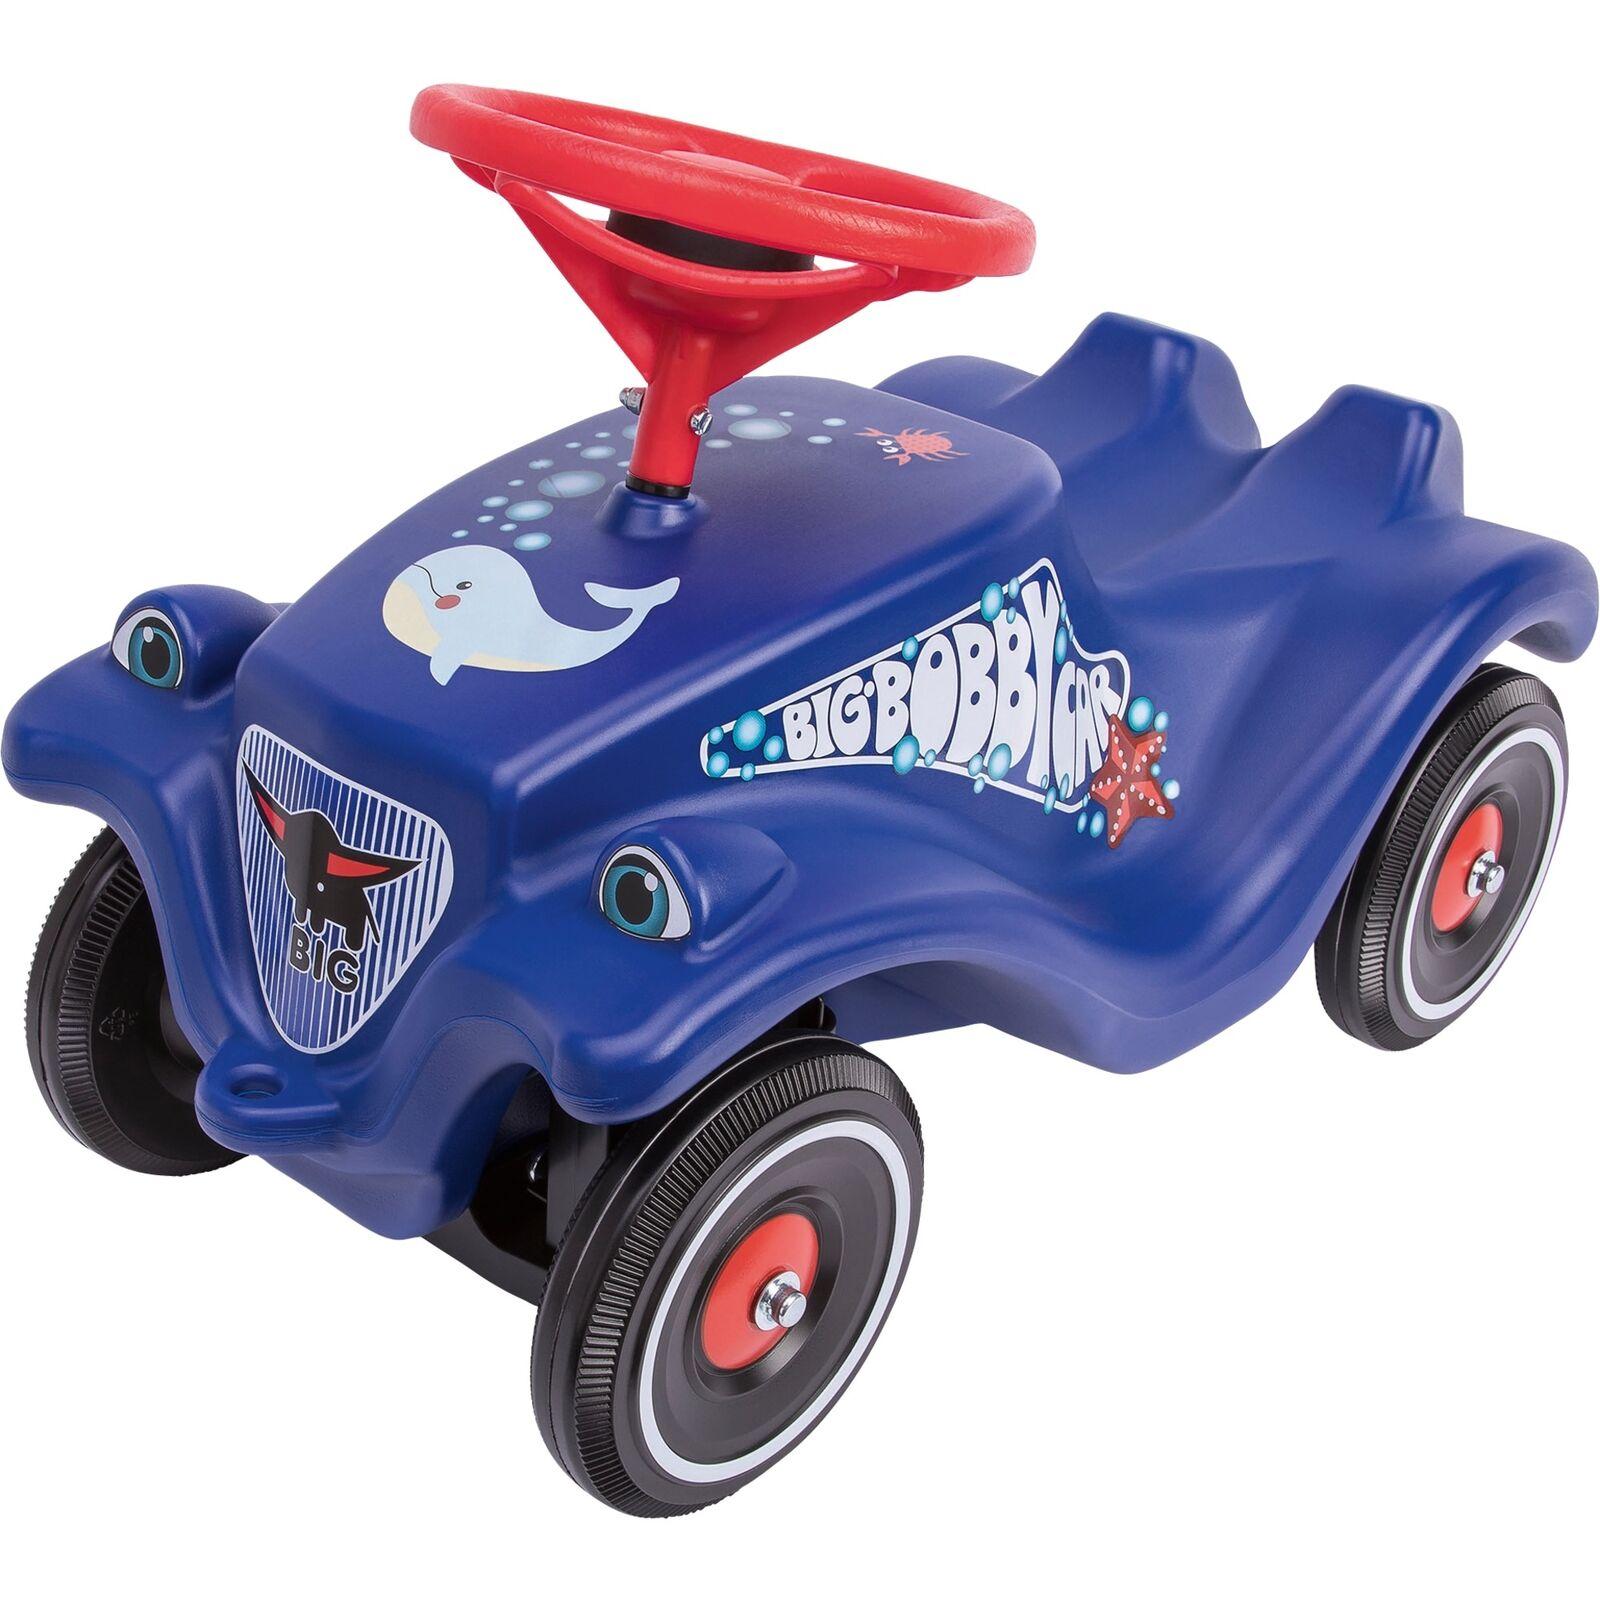 BIG Bobby Car Classic Ocean + Polis, Rutscher, dunkelblau